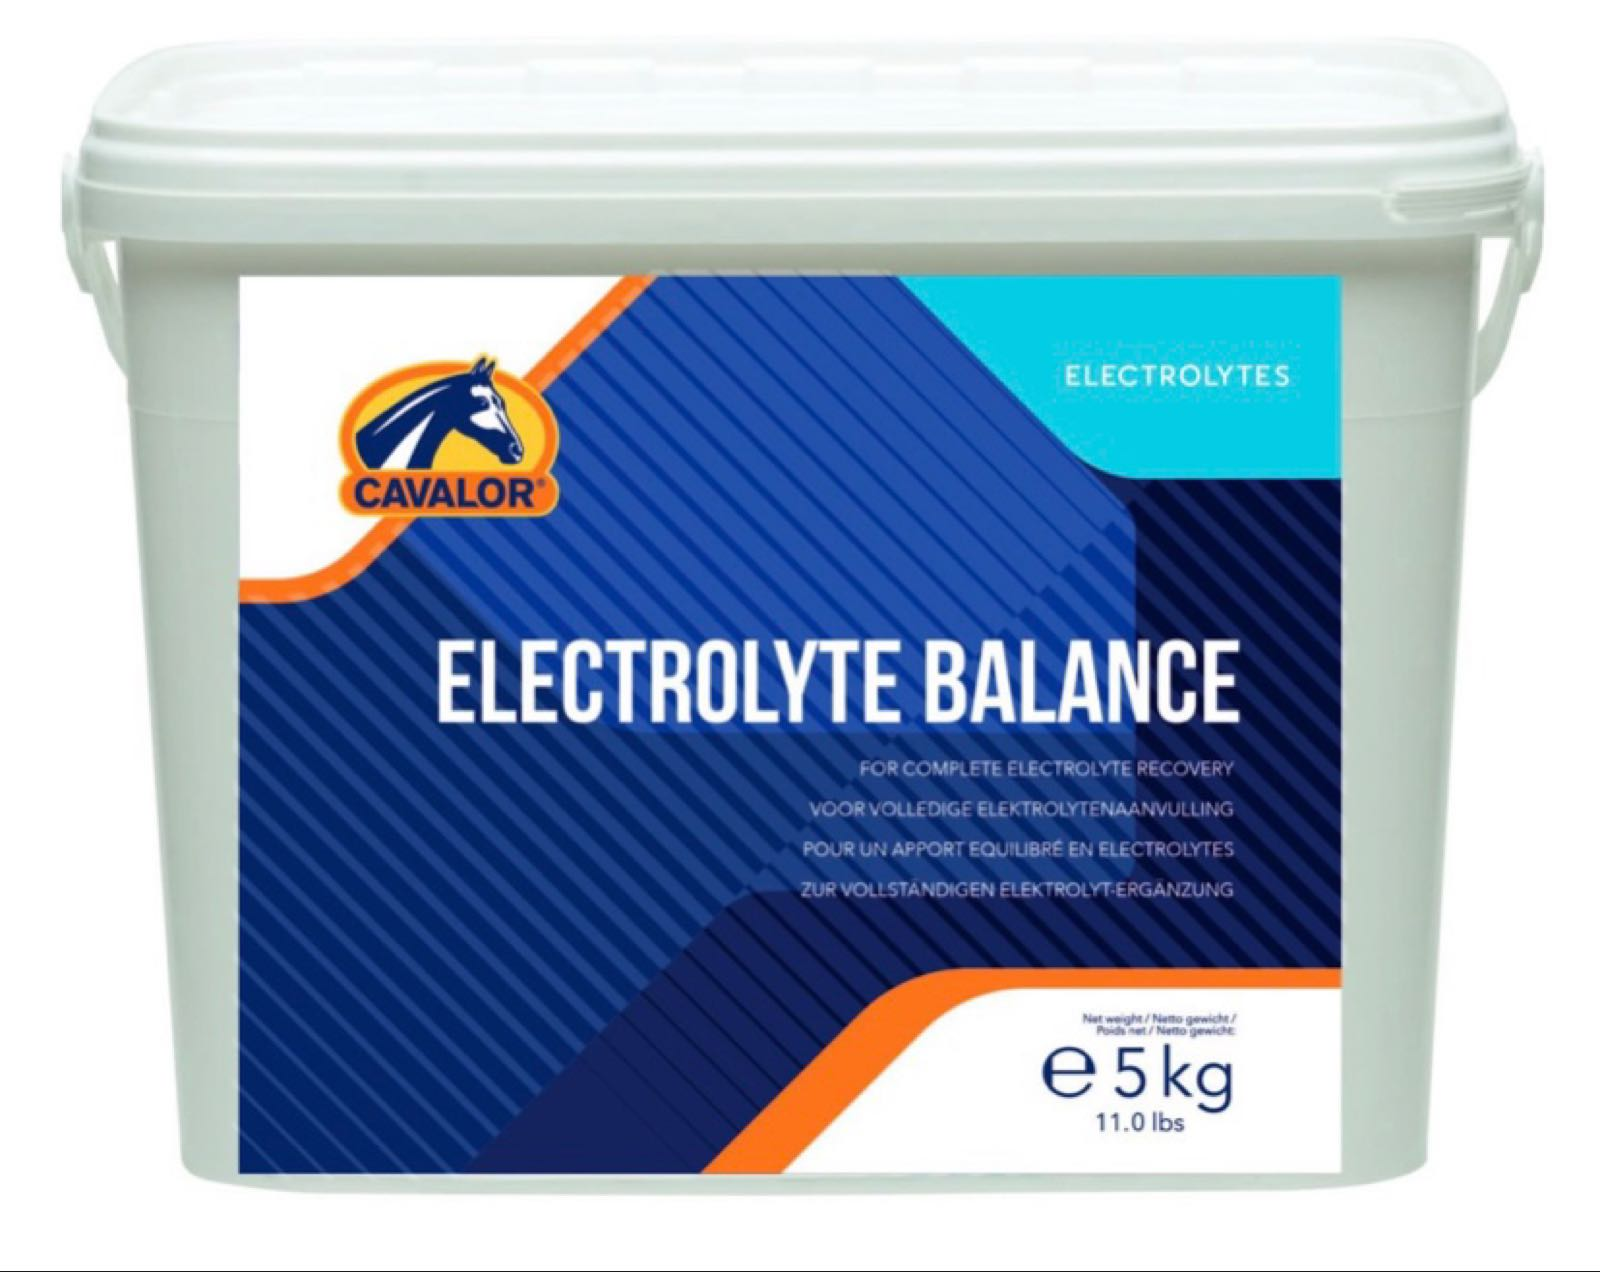 Electrolyte Balance 5kg